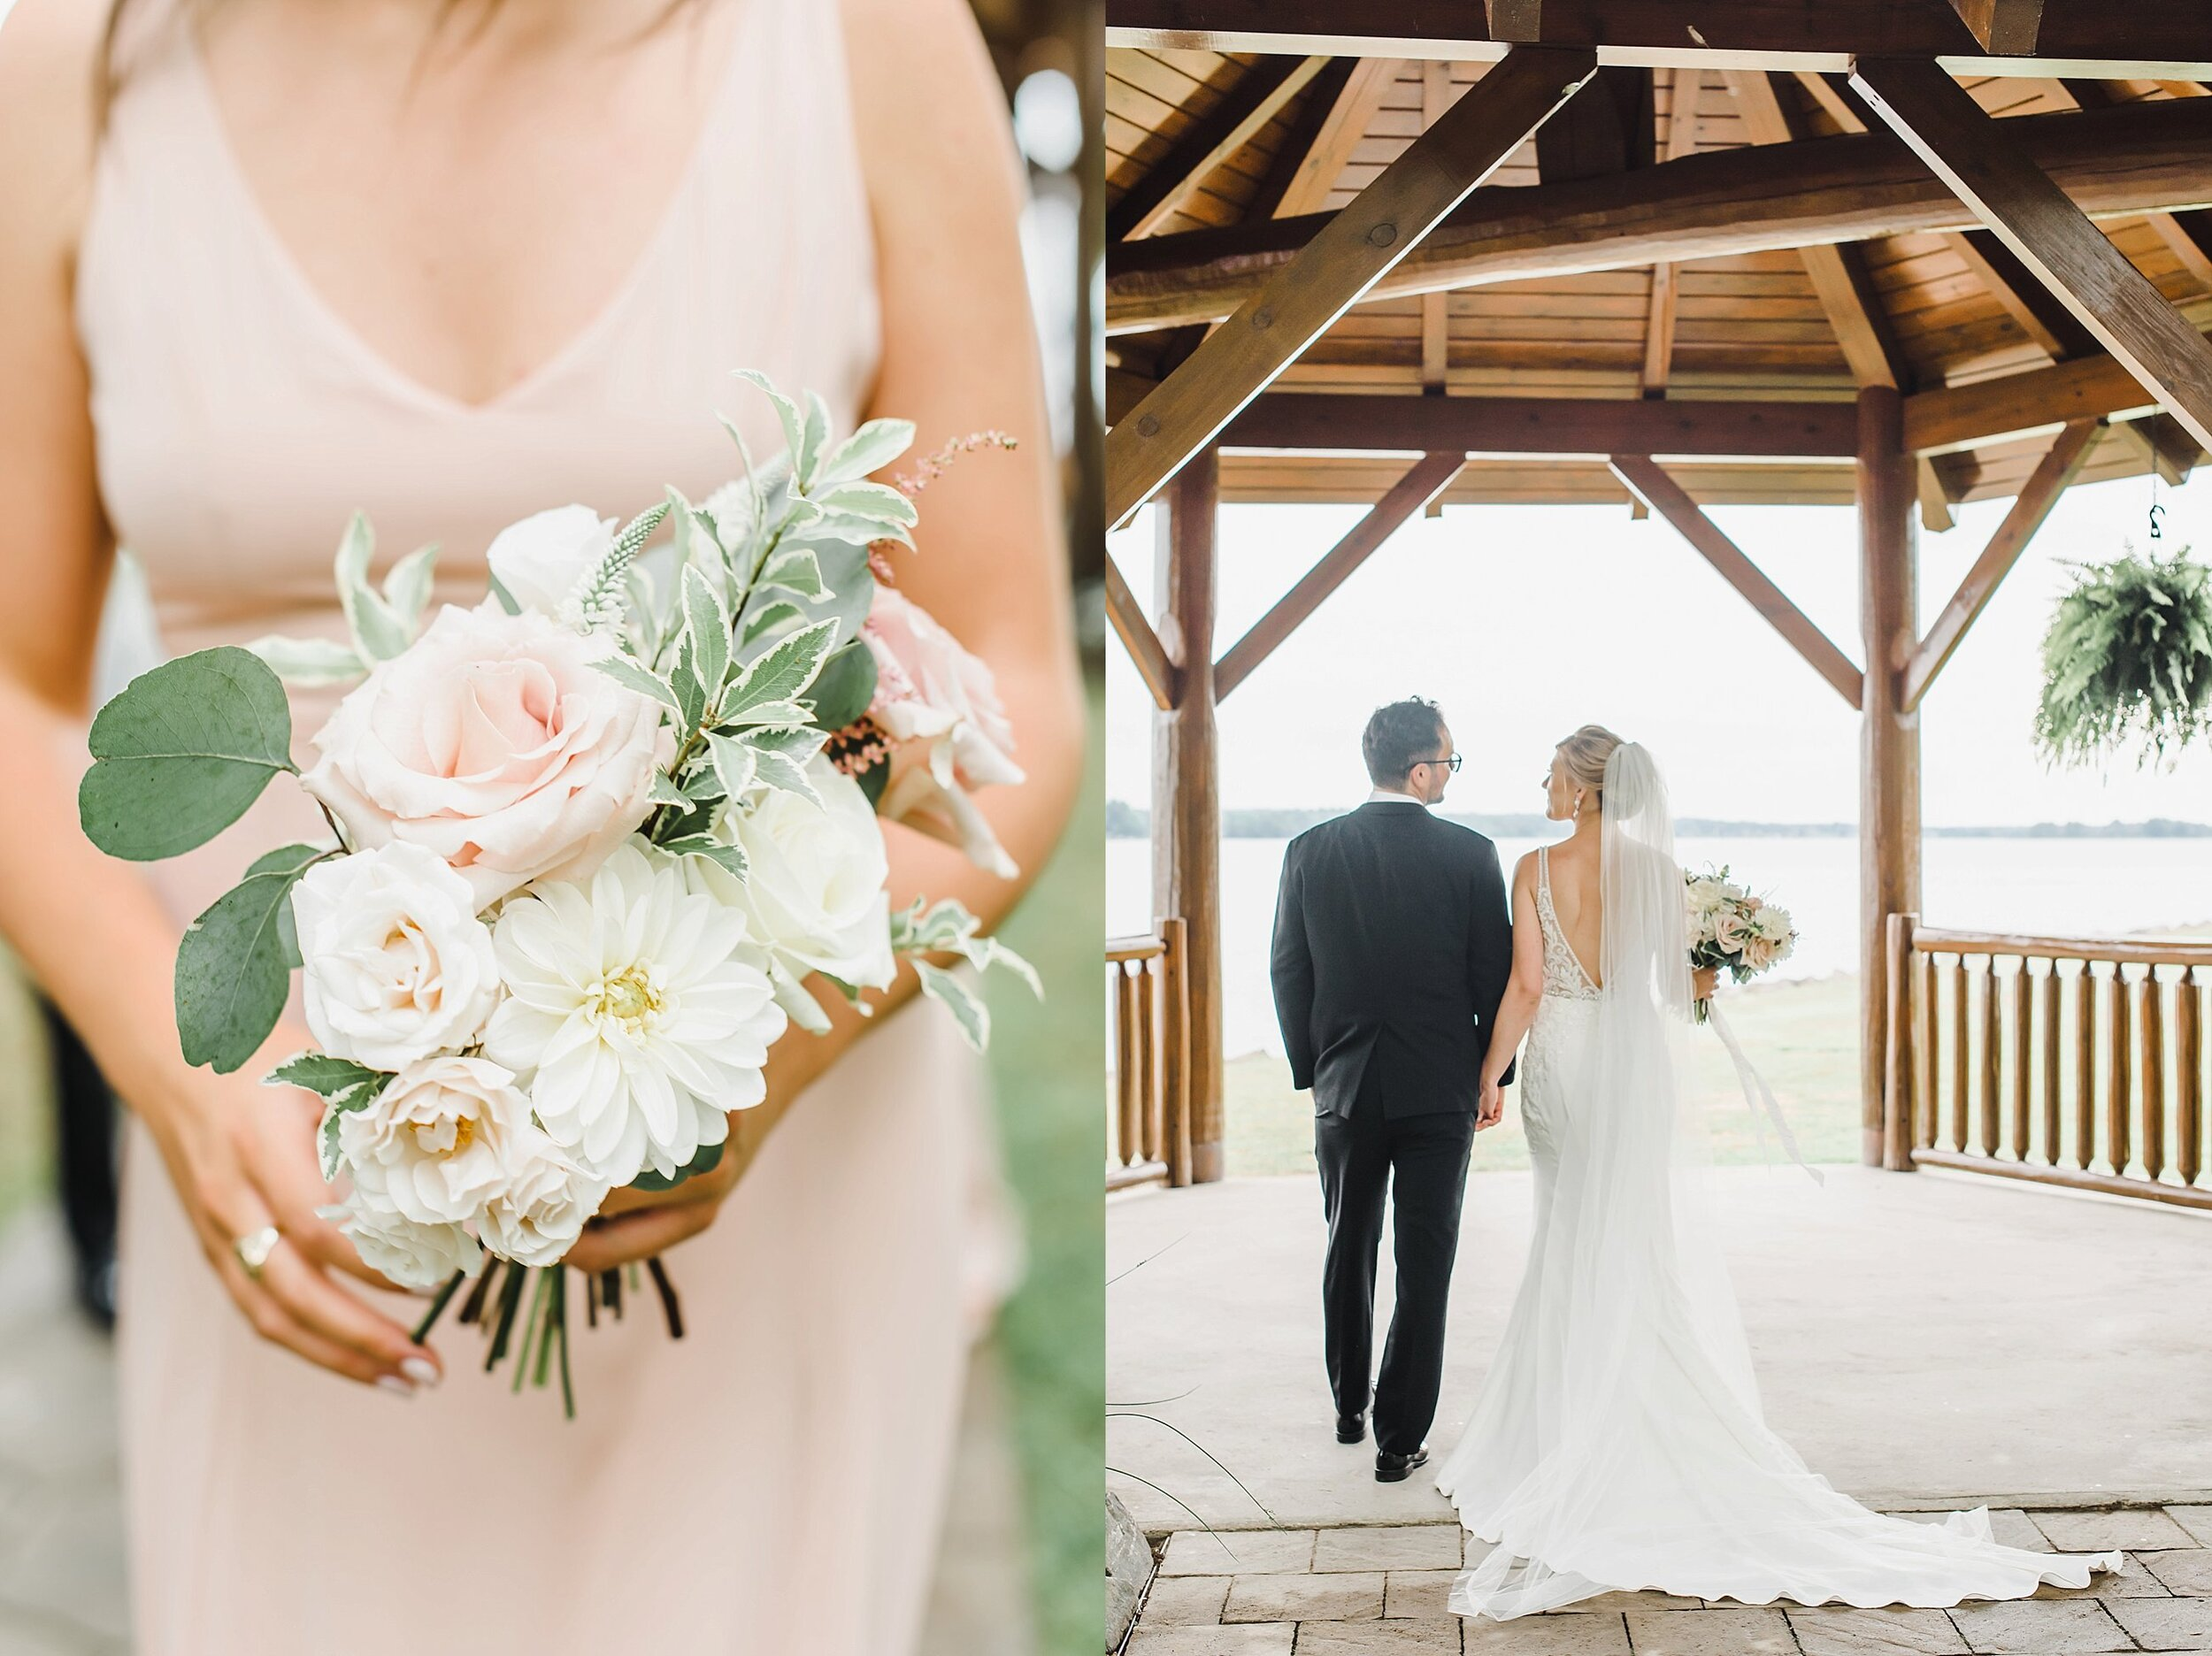 light airy fine art ottawa wedding photographer | Ali and Batoul Photography | Fairmont Le Chateau Montebello49.jpg